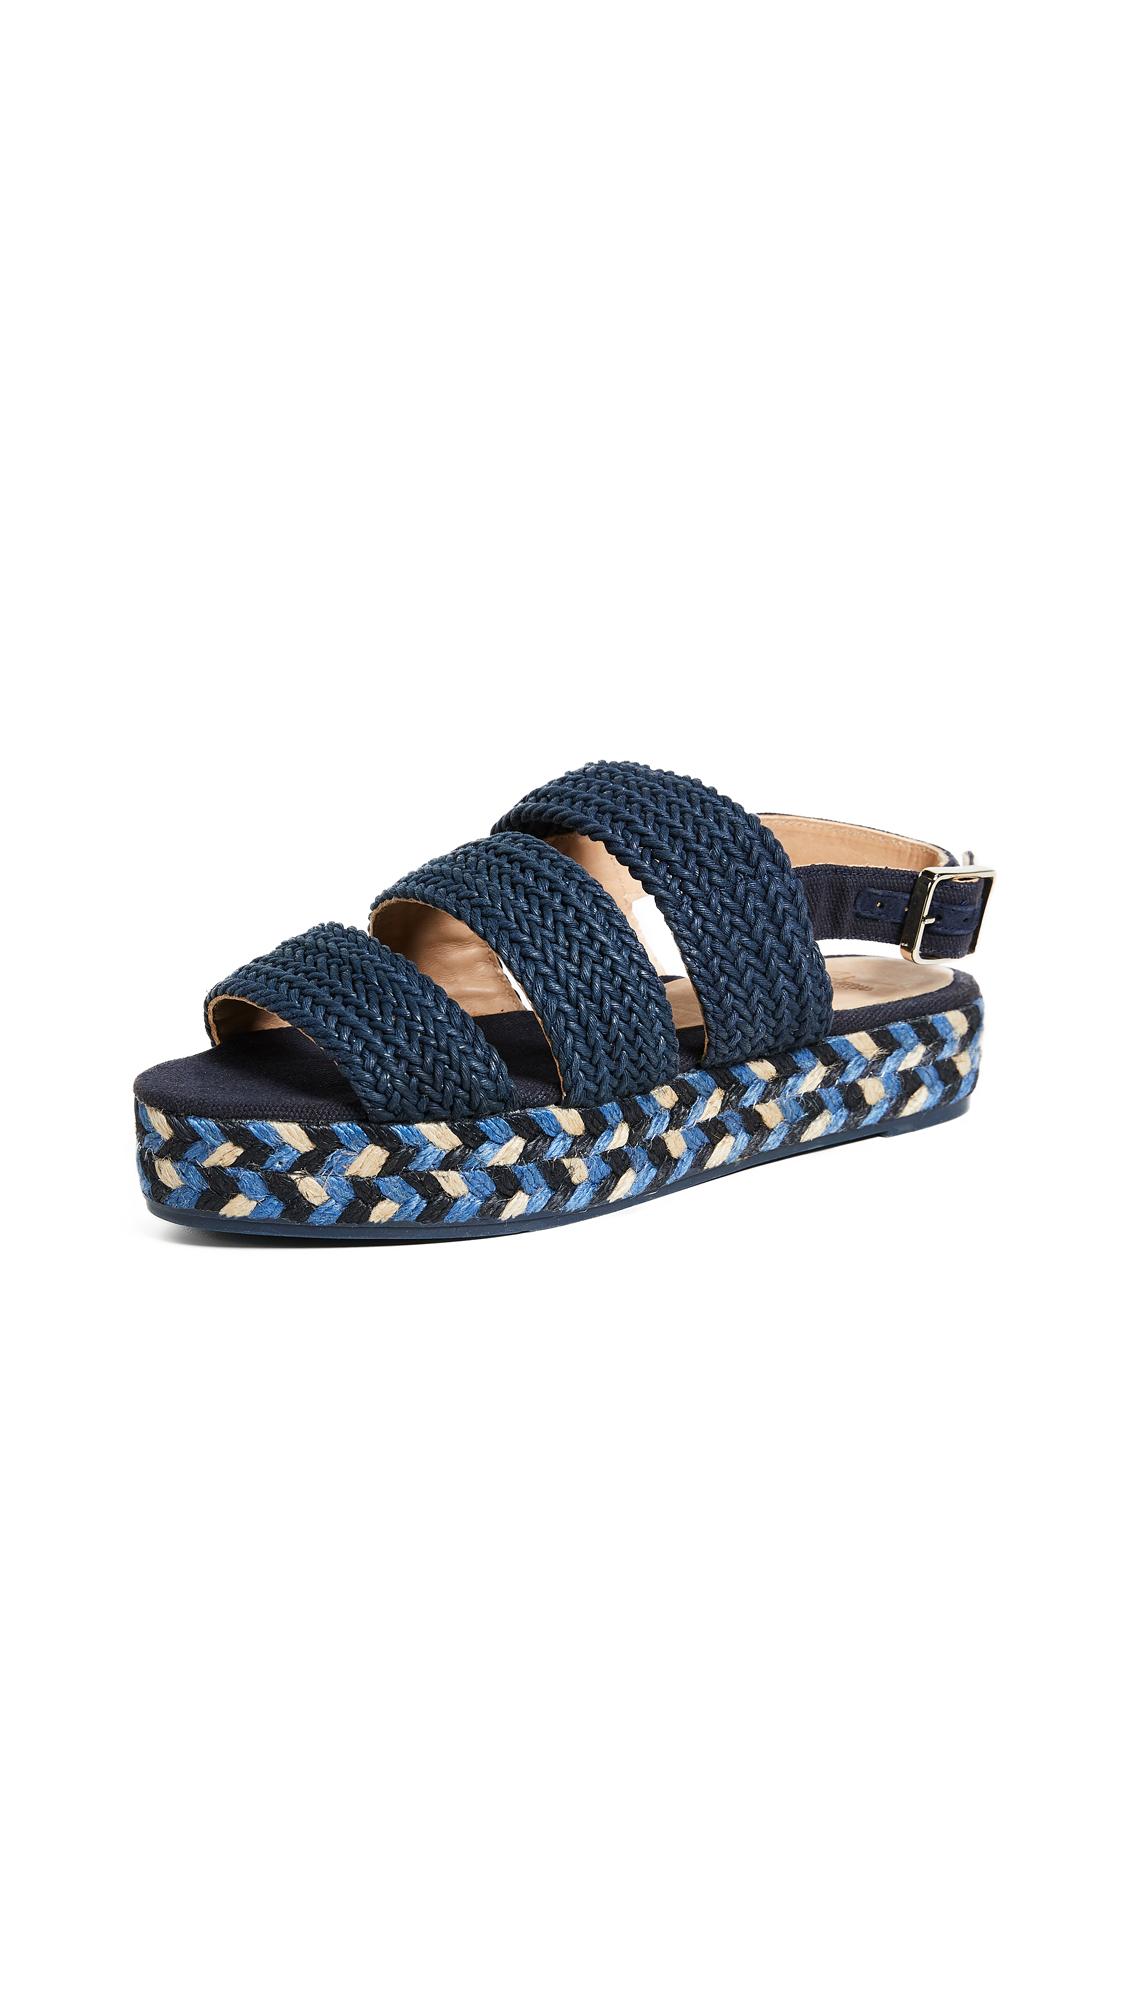 Castaner Wakame Flatform Sandals - Azul Oscuro